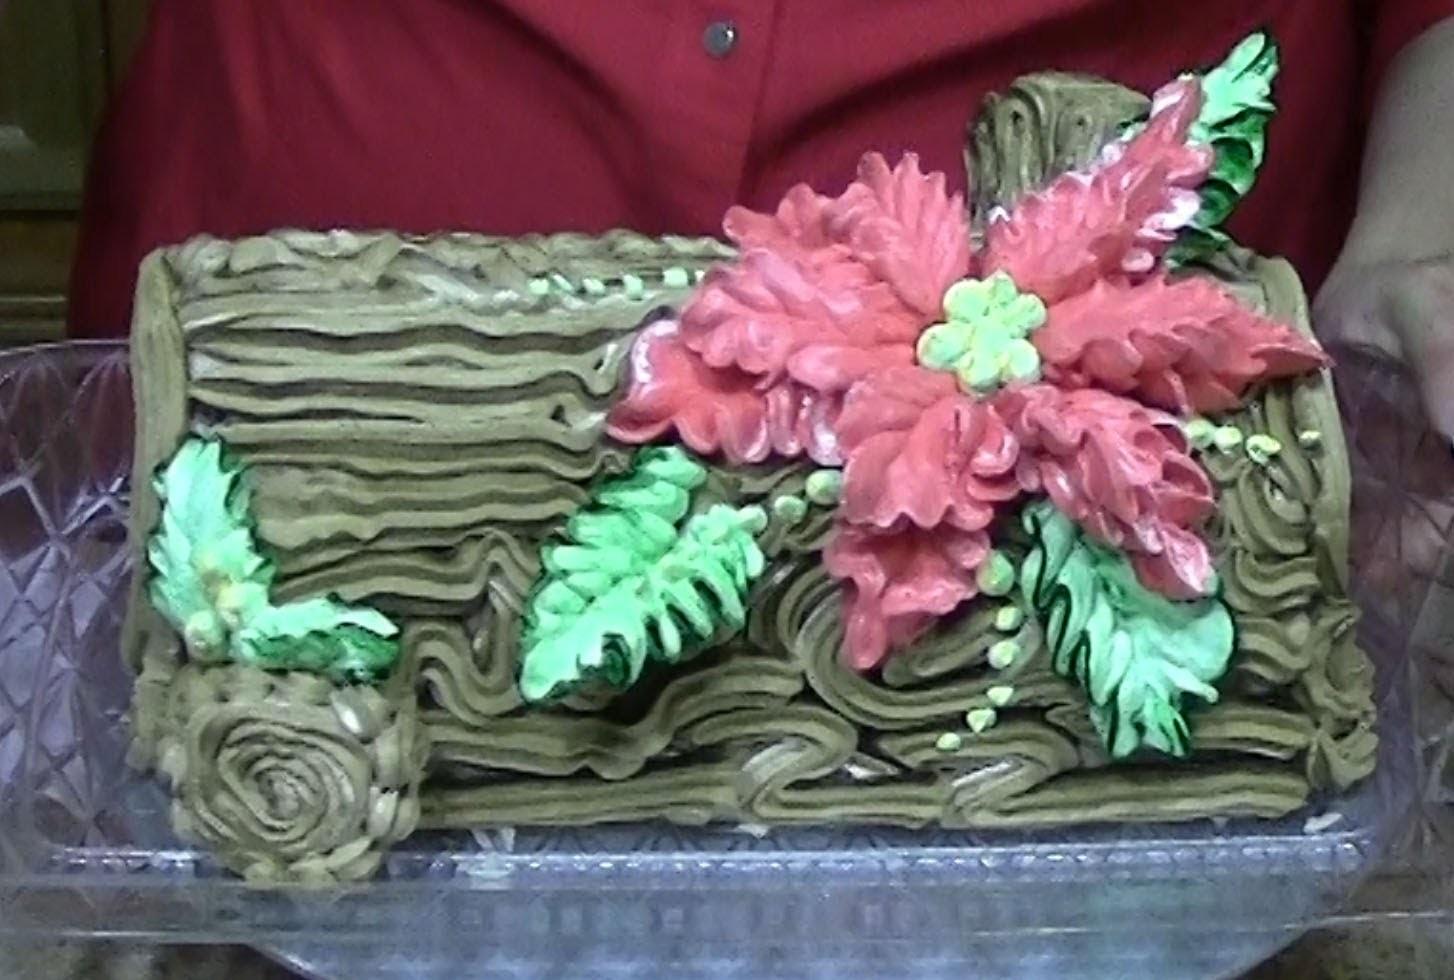 Poinsettia, Yule Log Cake, How to Decorate, Cake Decorating, Christmas